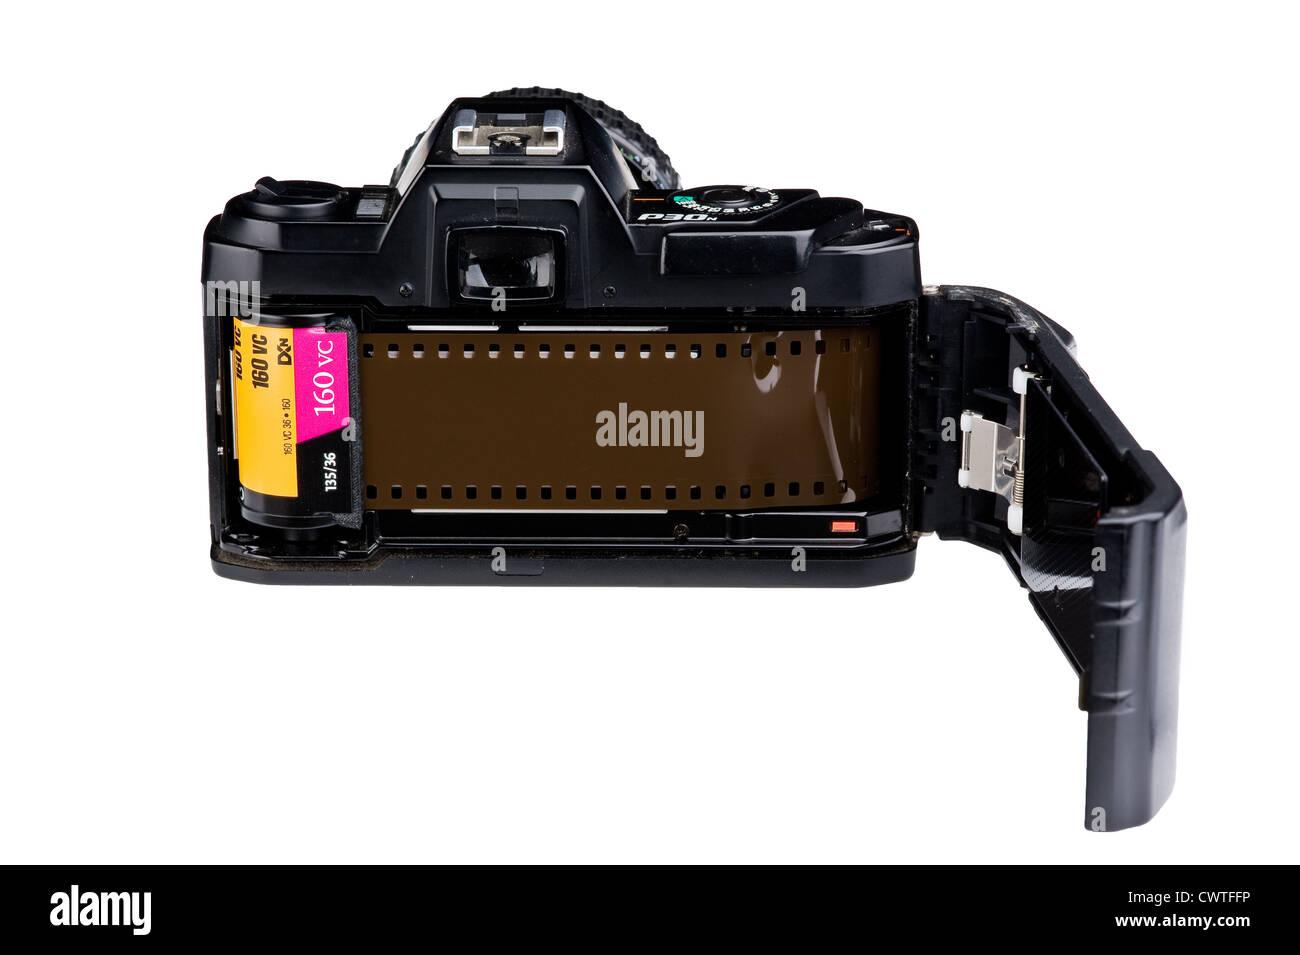 Pentax 35mm film camera. - Stock Image